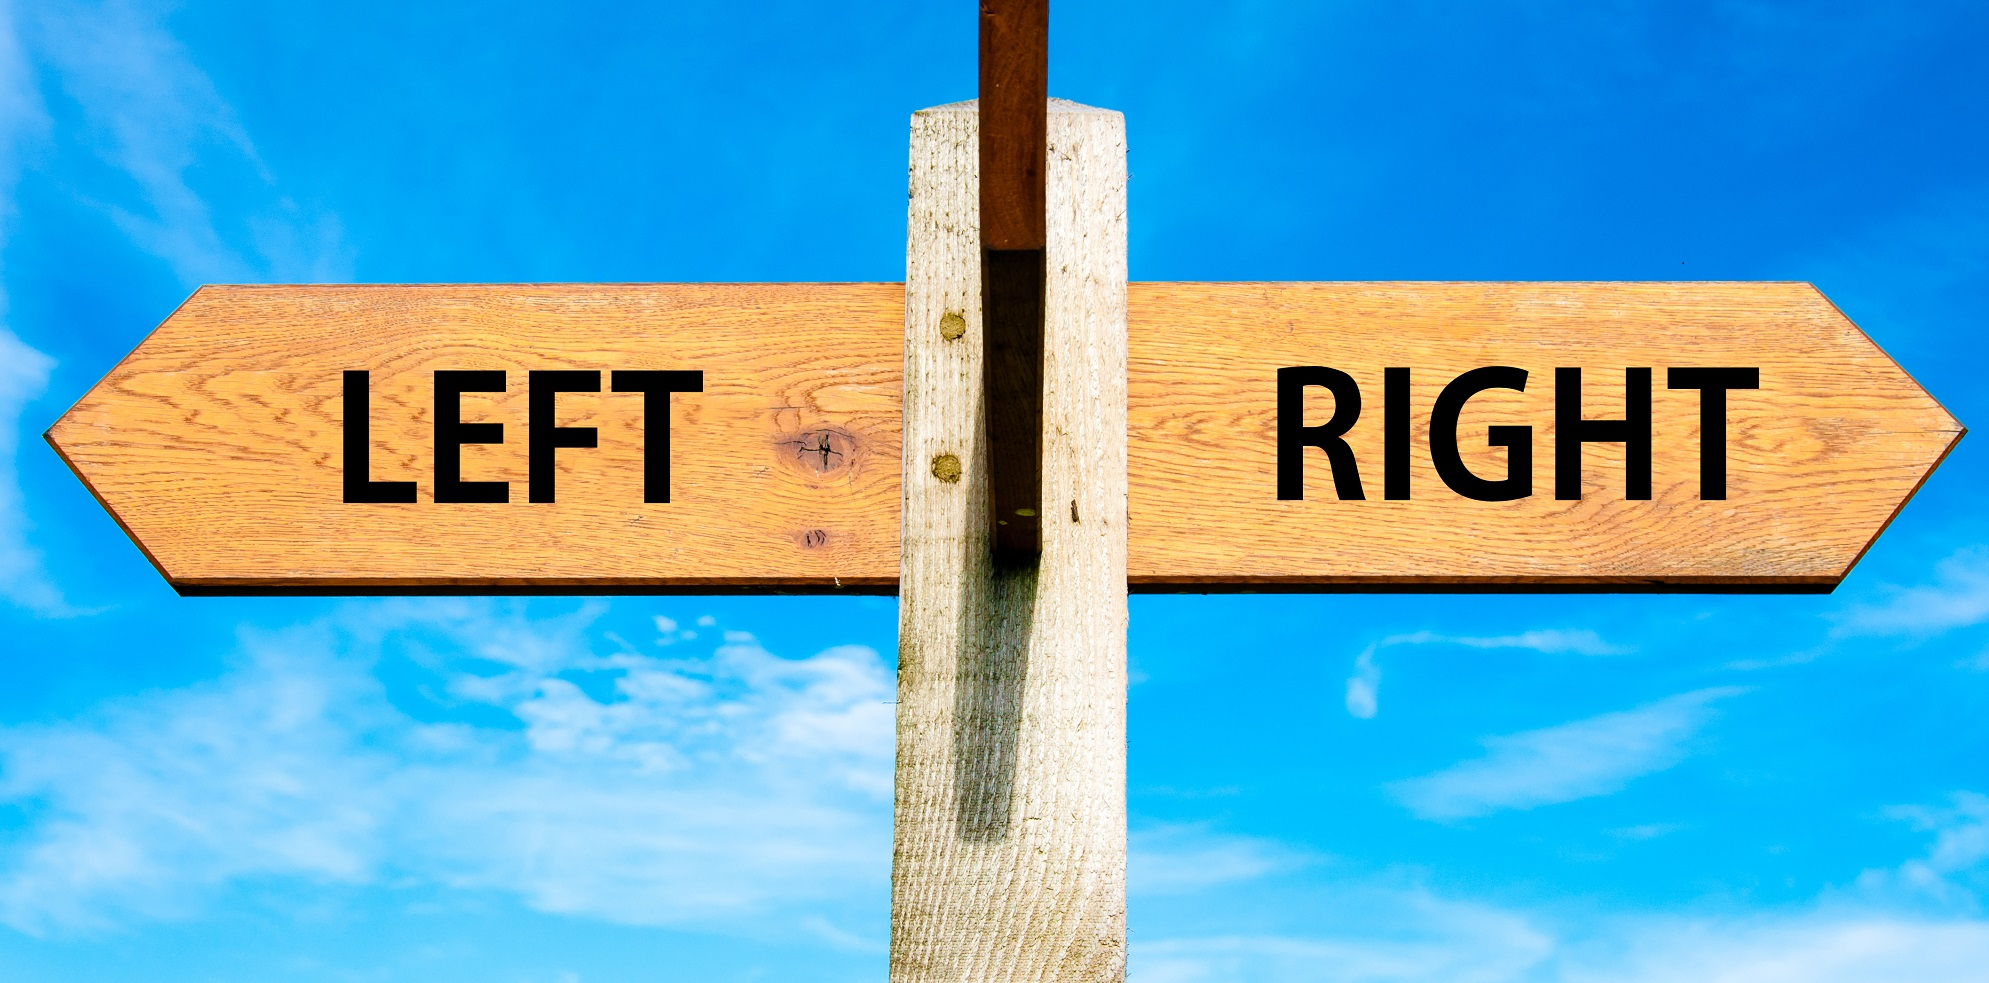 Right to left languages | Andiamo! The Language Professionals